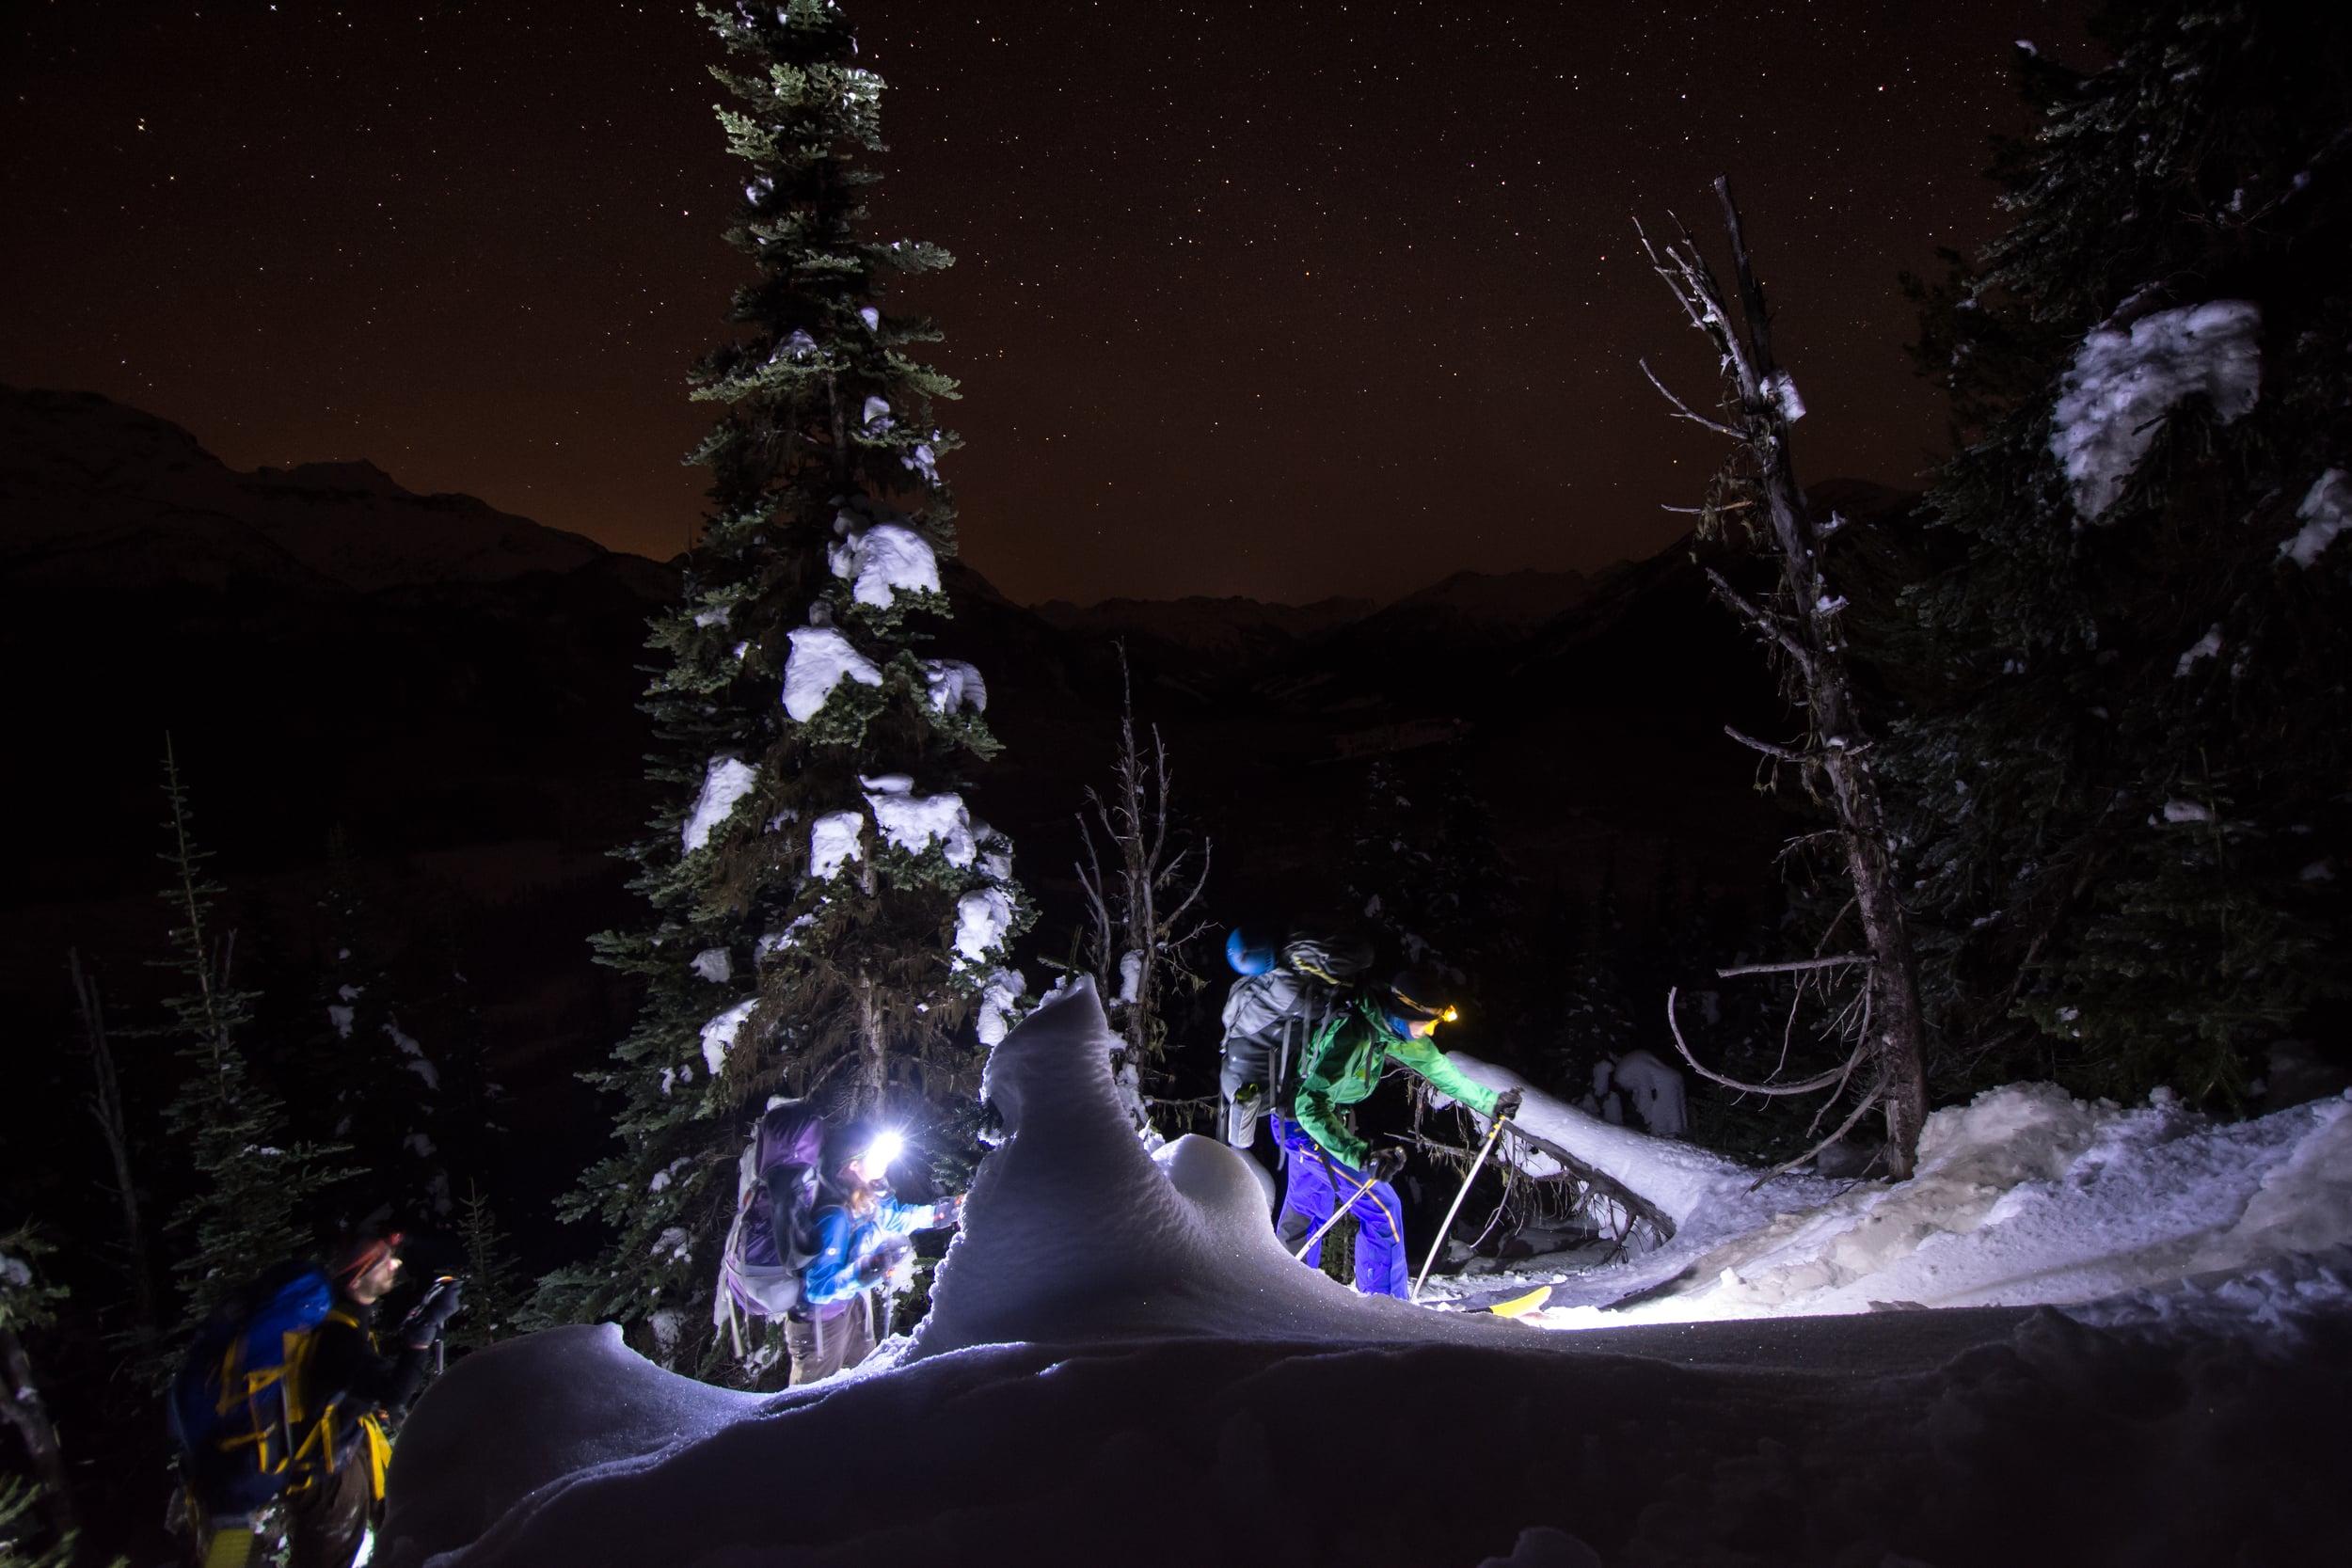 Laurent, Janelle, and Steve make their way up the dark skin track, Rohr Ridge, British Columbia, Dec 2015.